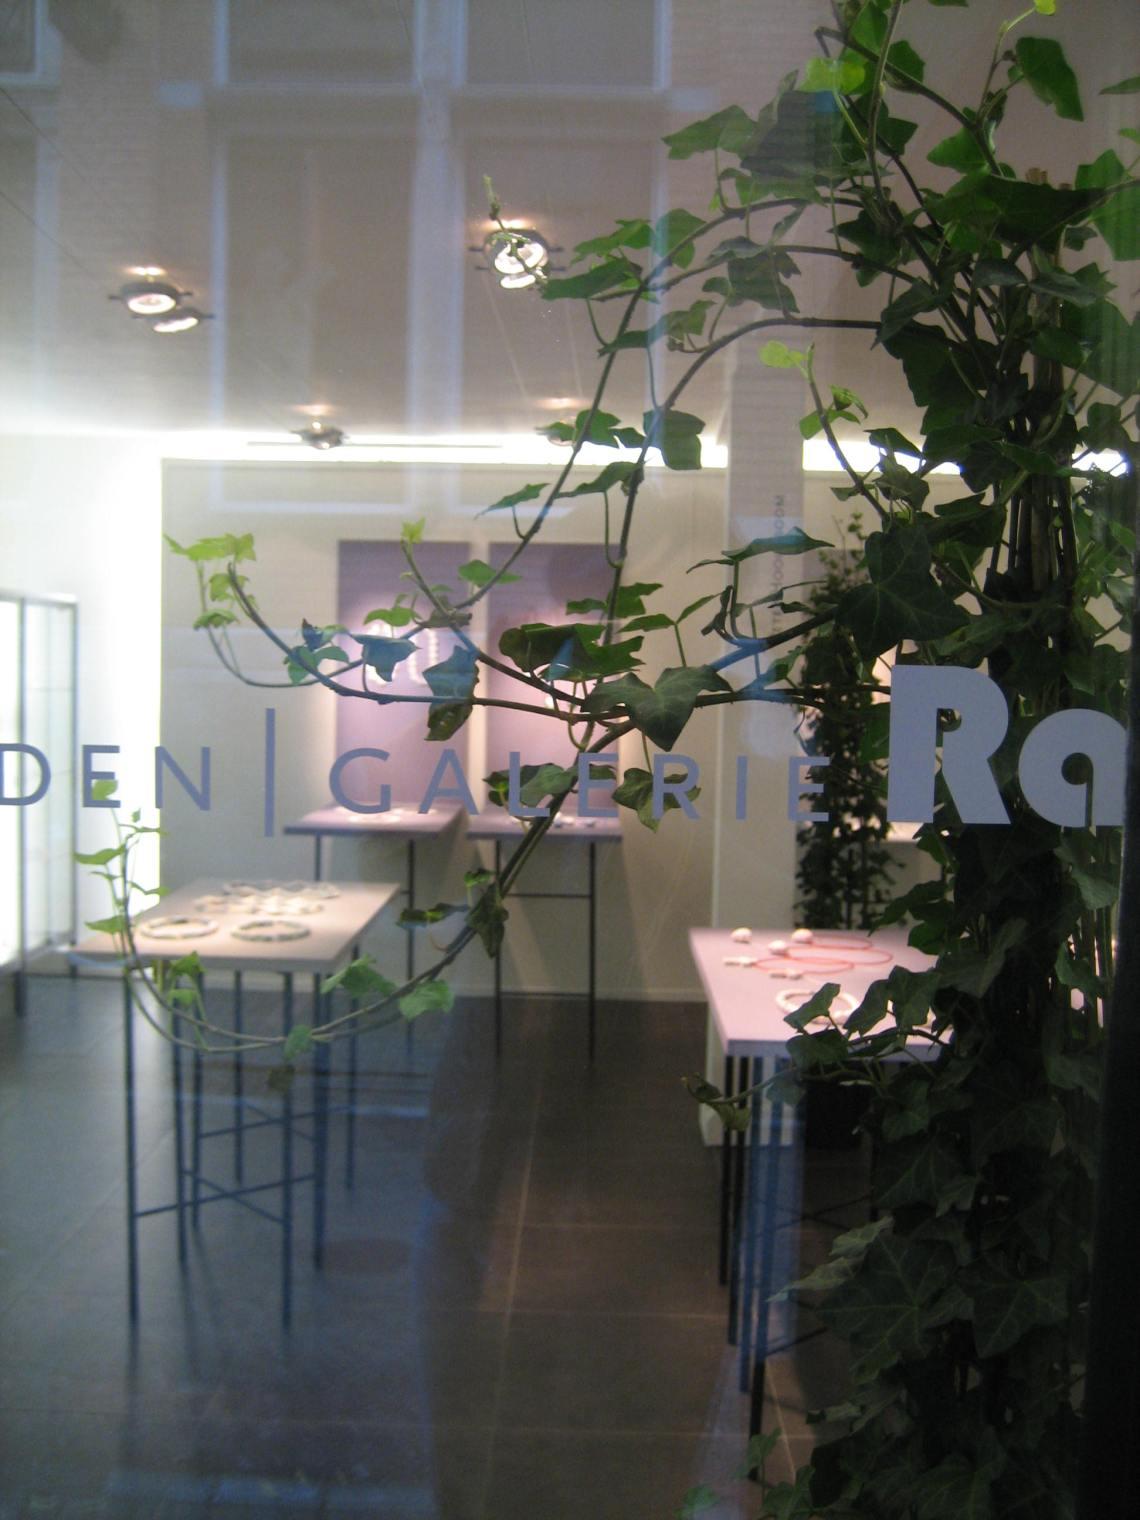 Galerie Ra, 2017. Foto Esther Doornbusch, CC BY 4.0